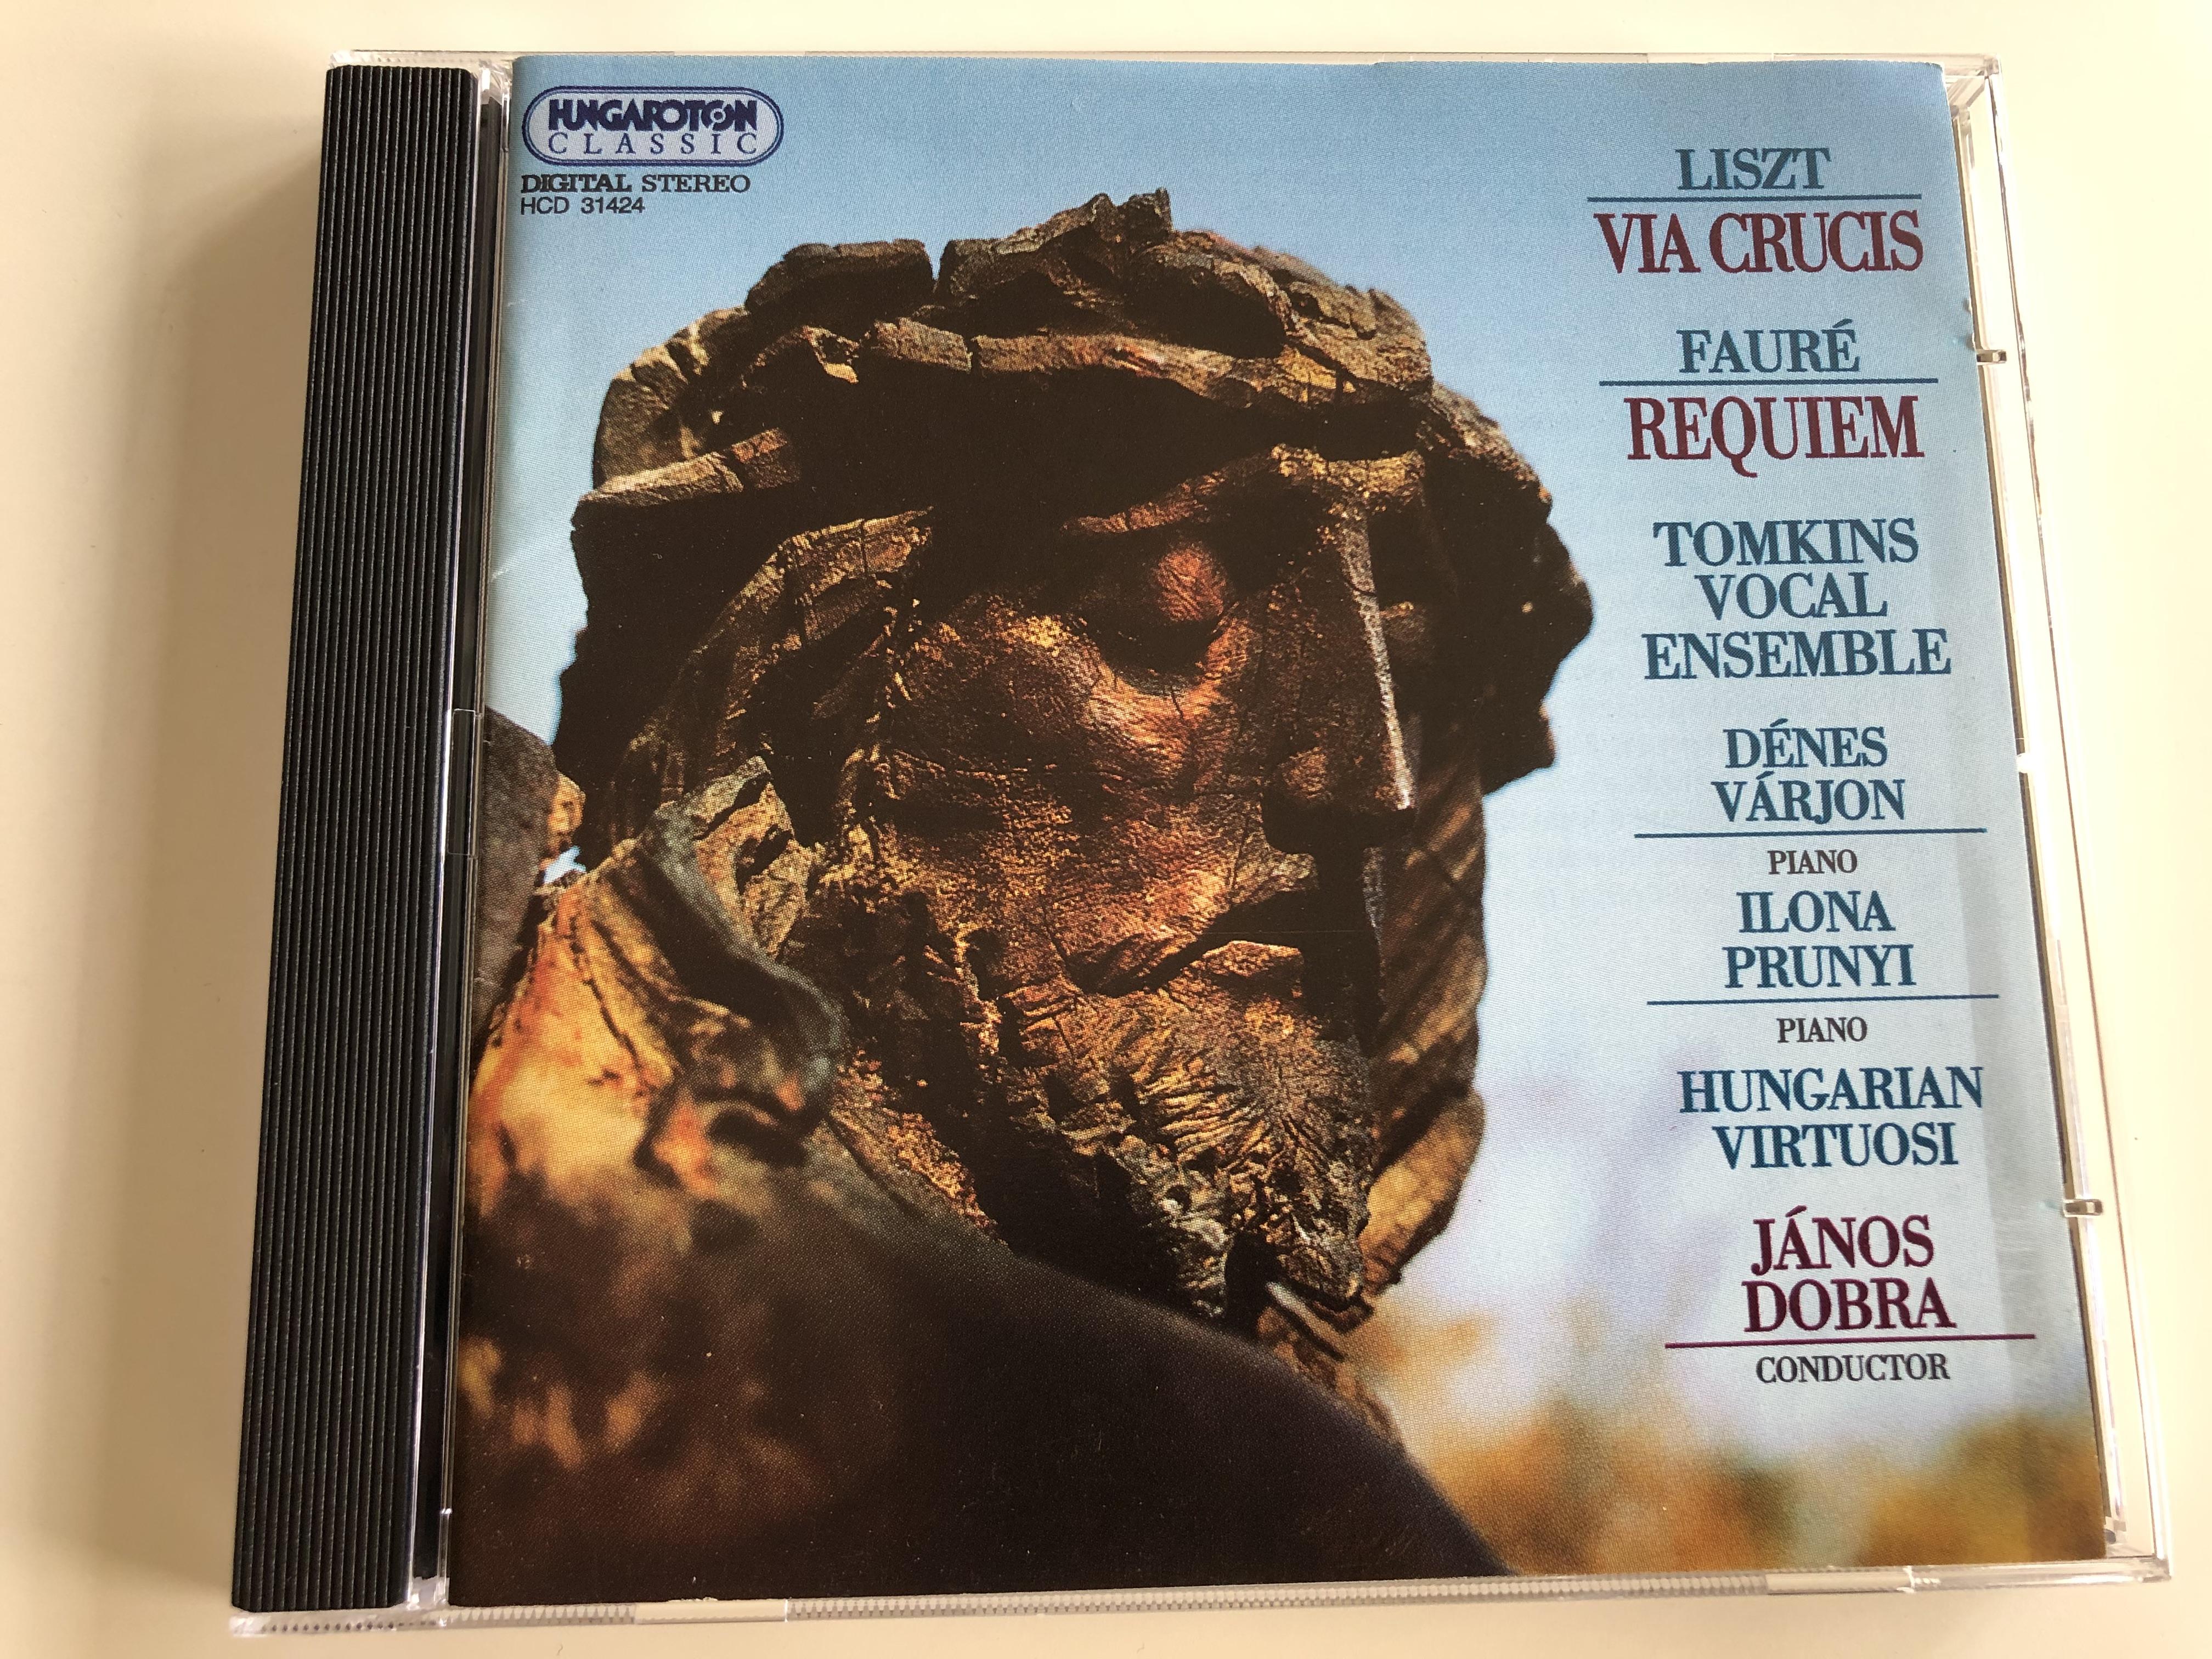 liszt-via-crucis-faur-requiem-tomkins-vocal-ensemble-d-nes-v-rjon-piano-ilona-prunyi-piano-hungarian-virtuosi-conducted-by-j-nos-dobra-hungaroton-classic-hcd-31424-1-.jpg